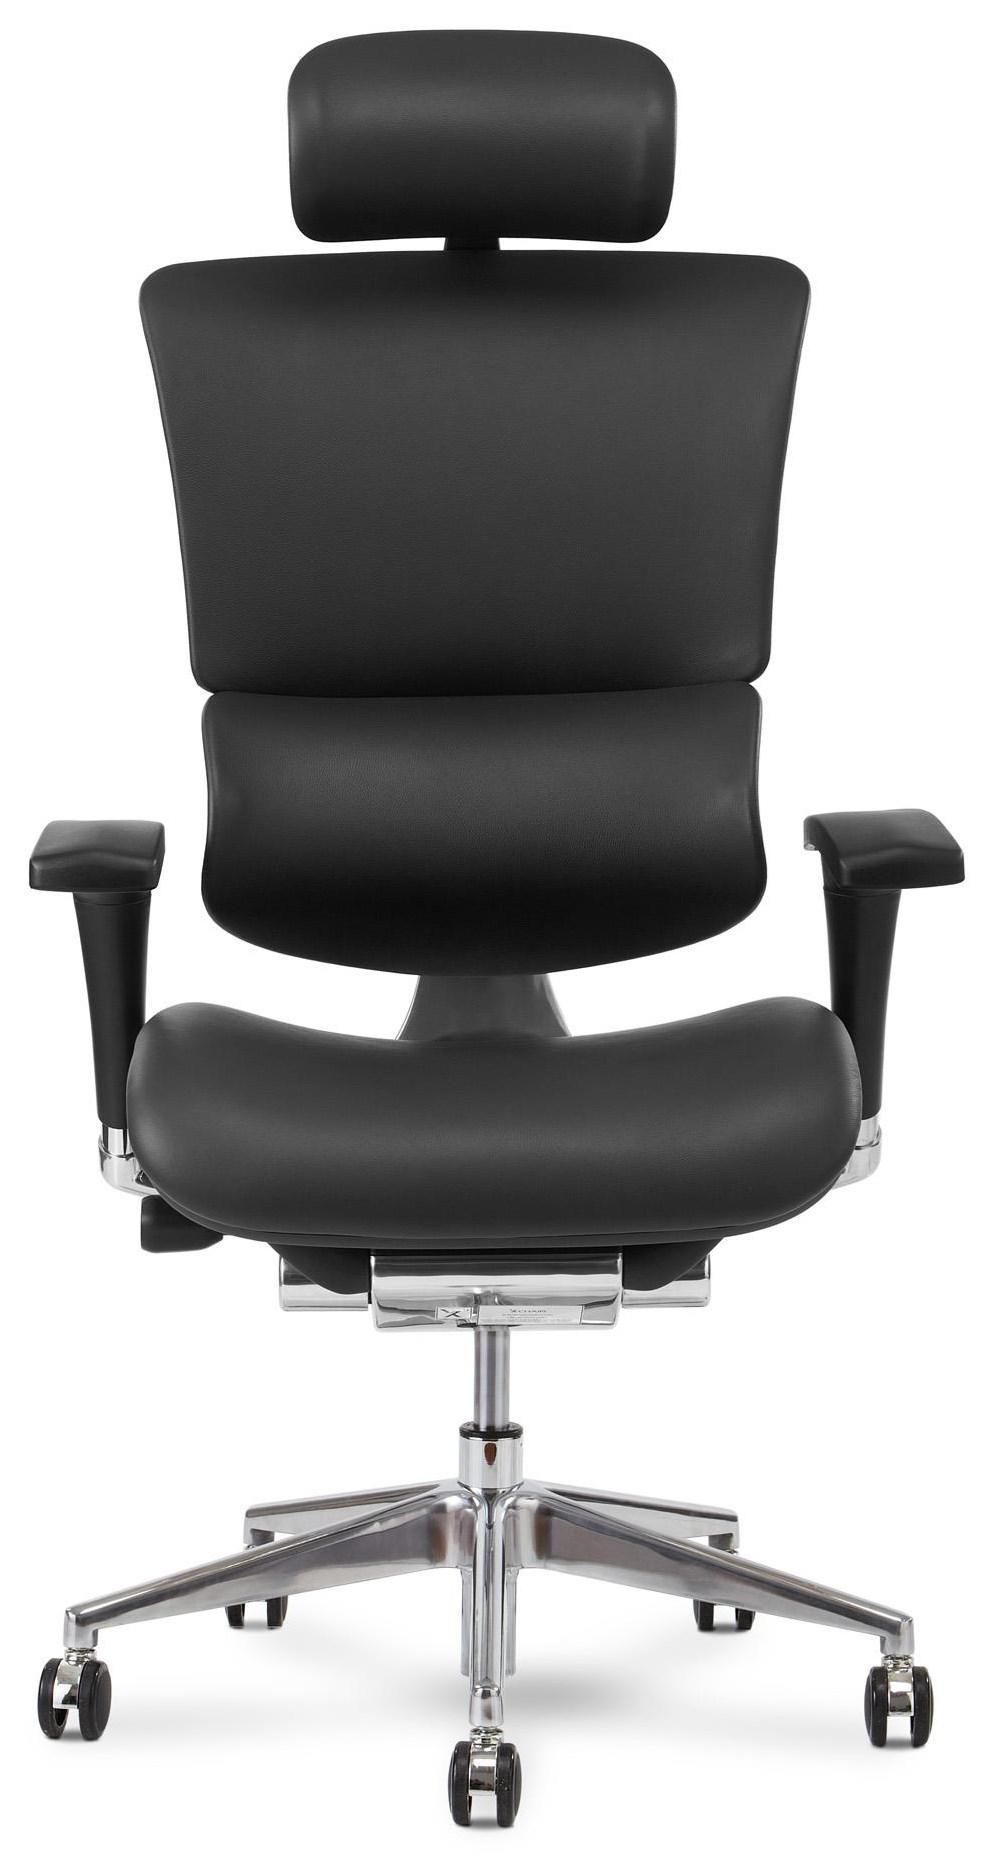 X4 Executive Chair by X-Chair at HomeWorld Furniture